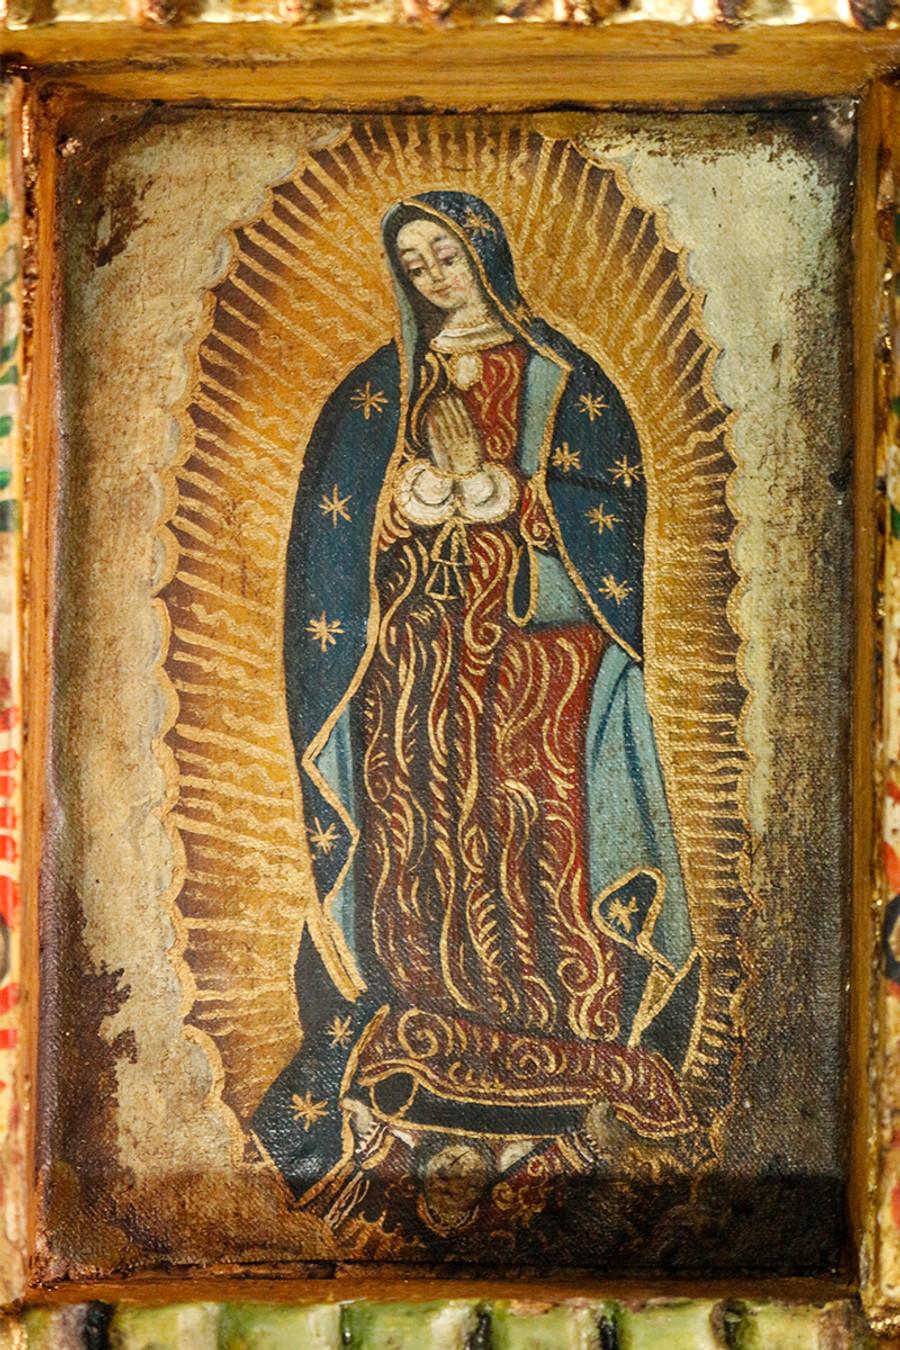 Guadalupe Virgin Colonial Peru Art Handmade Retablo Handcarved Altarpiece (4577)